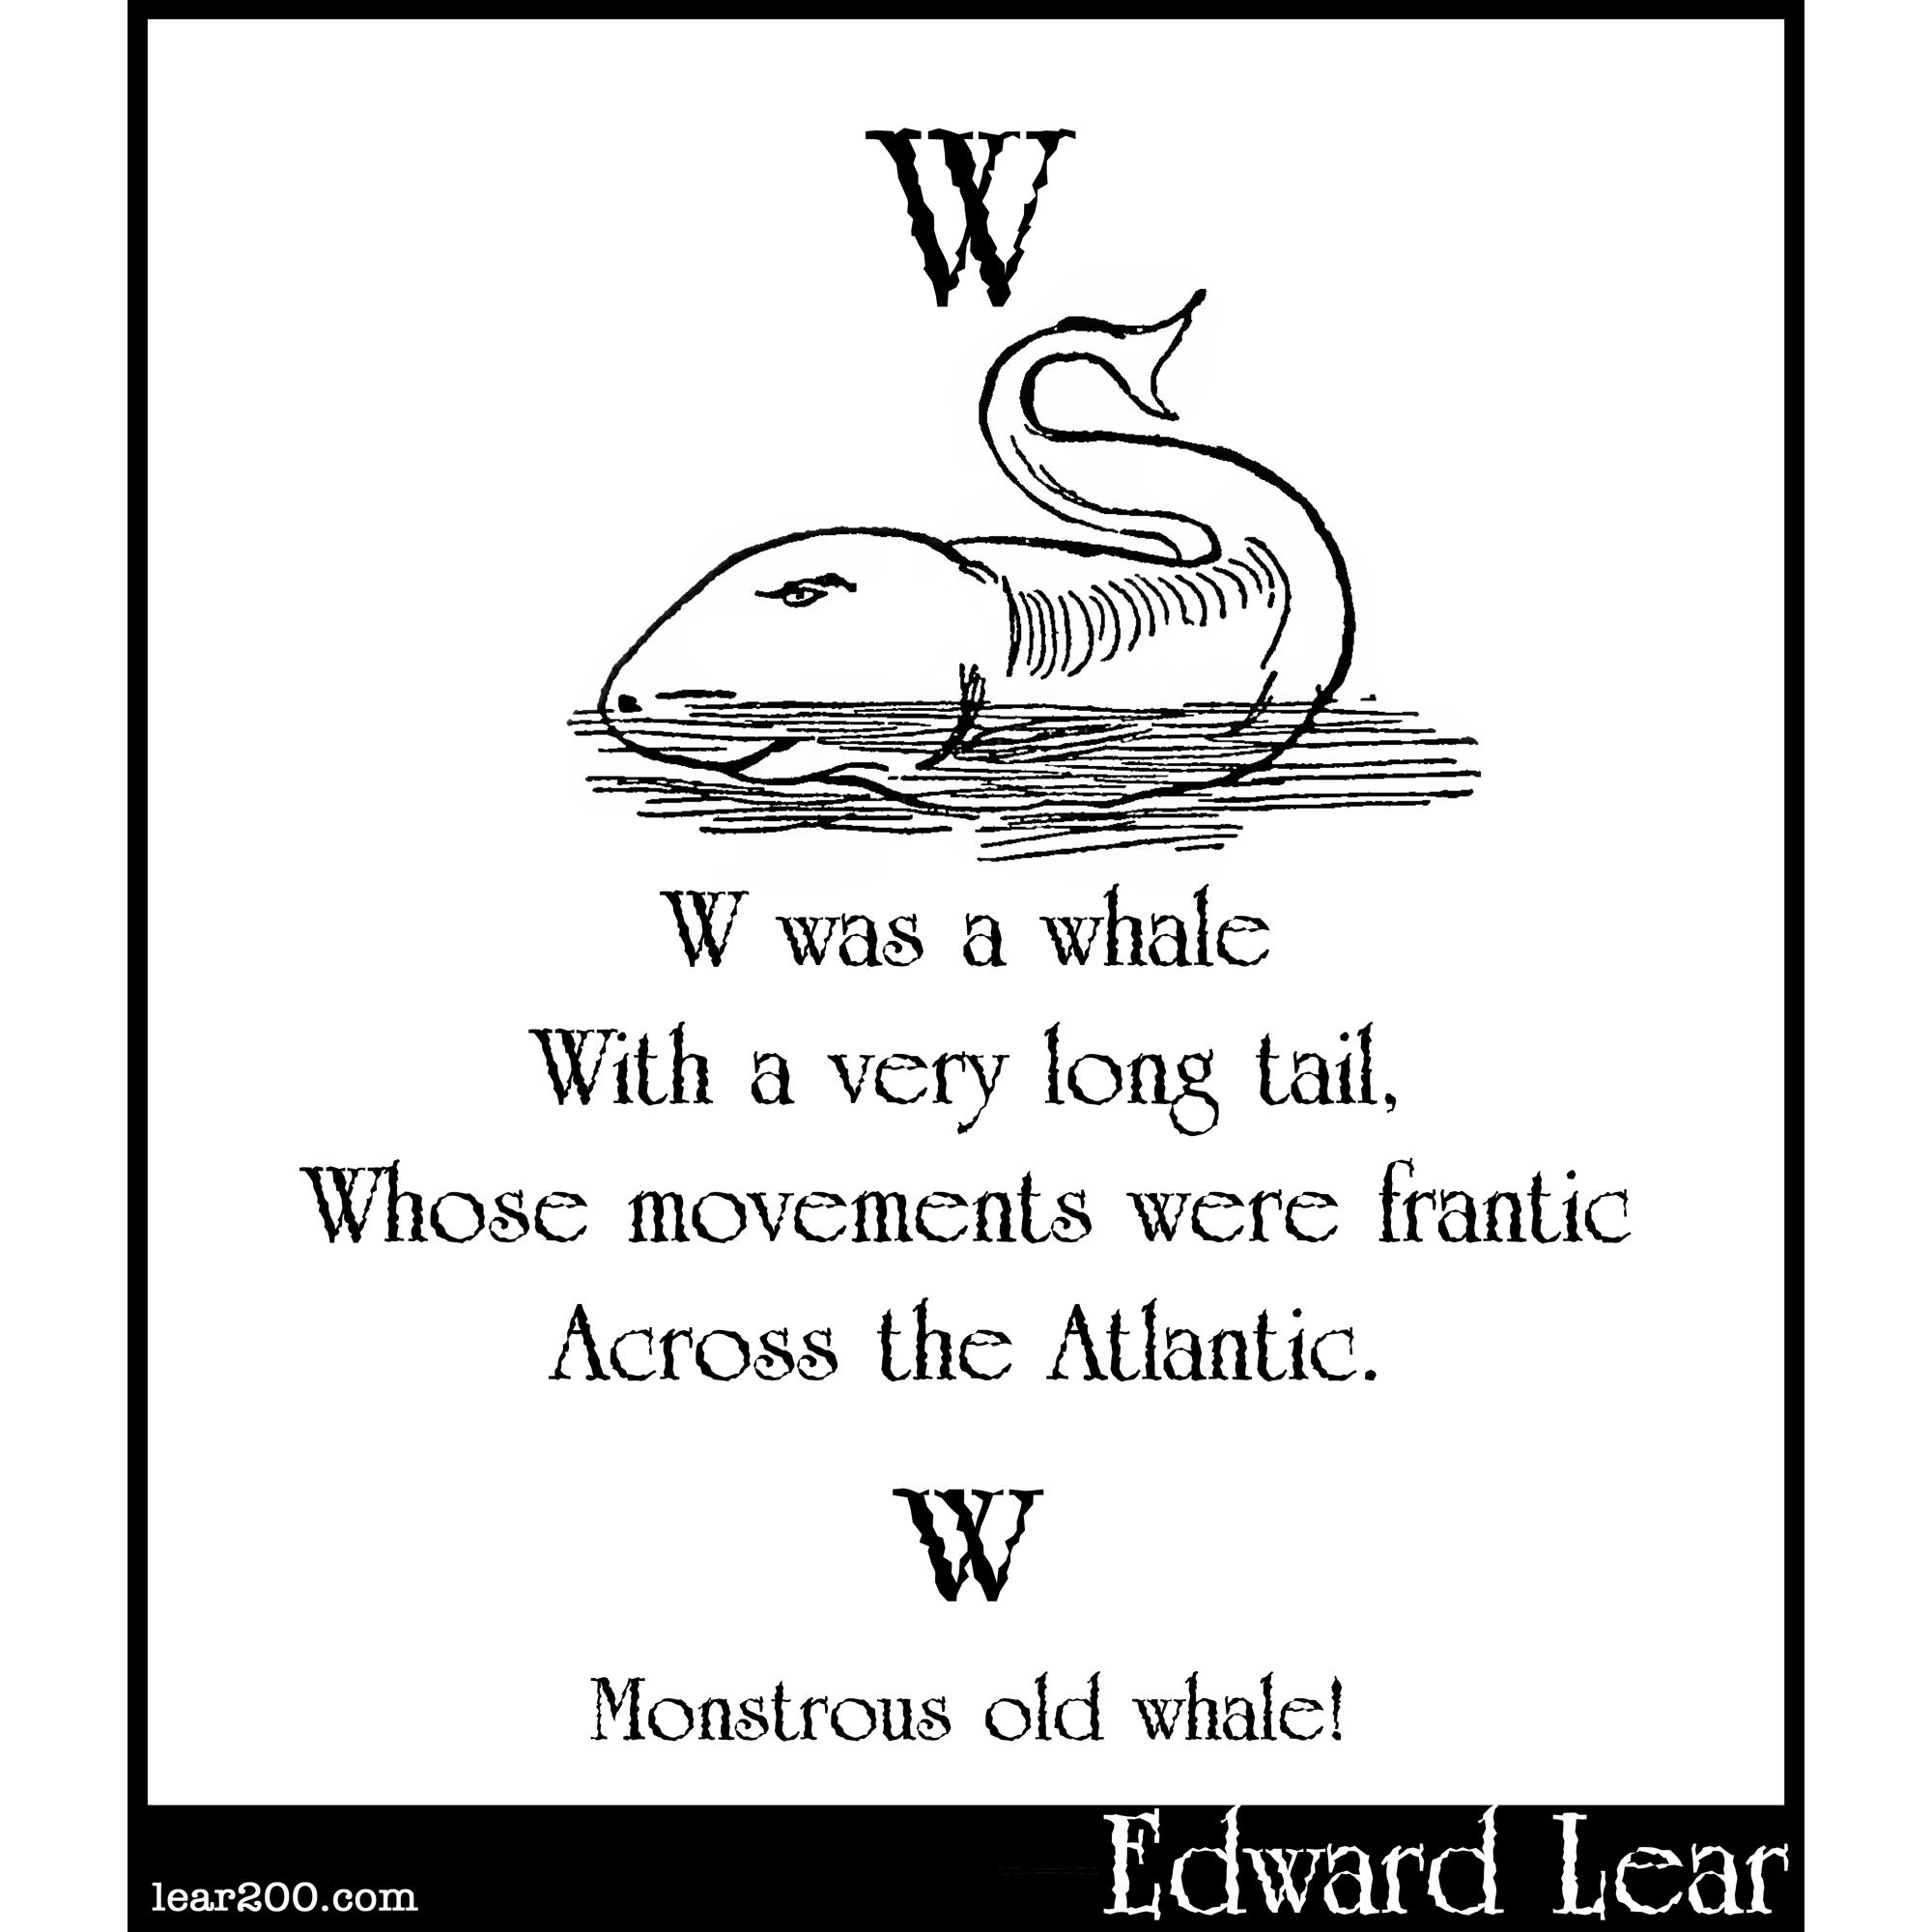 W was a whale